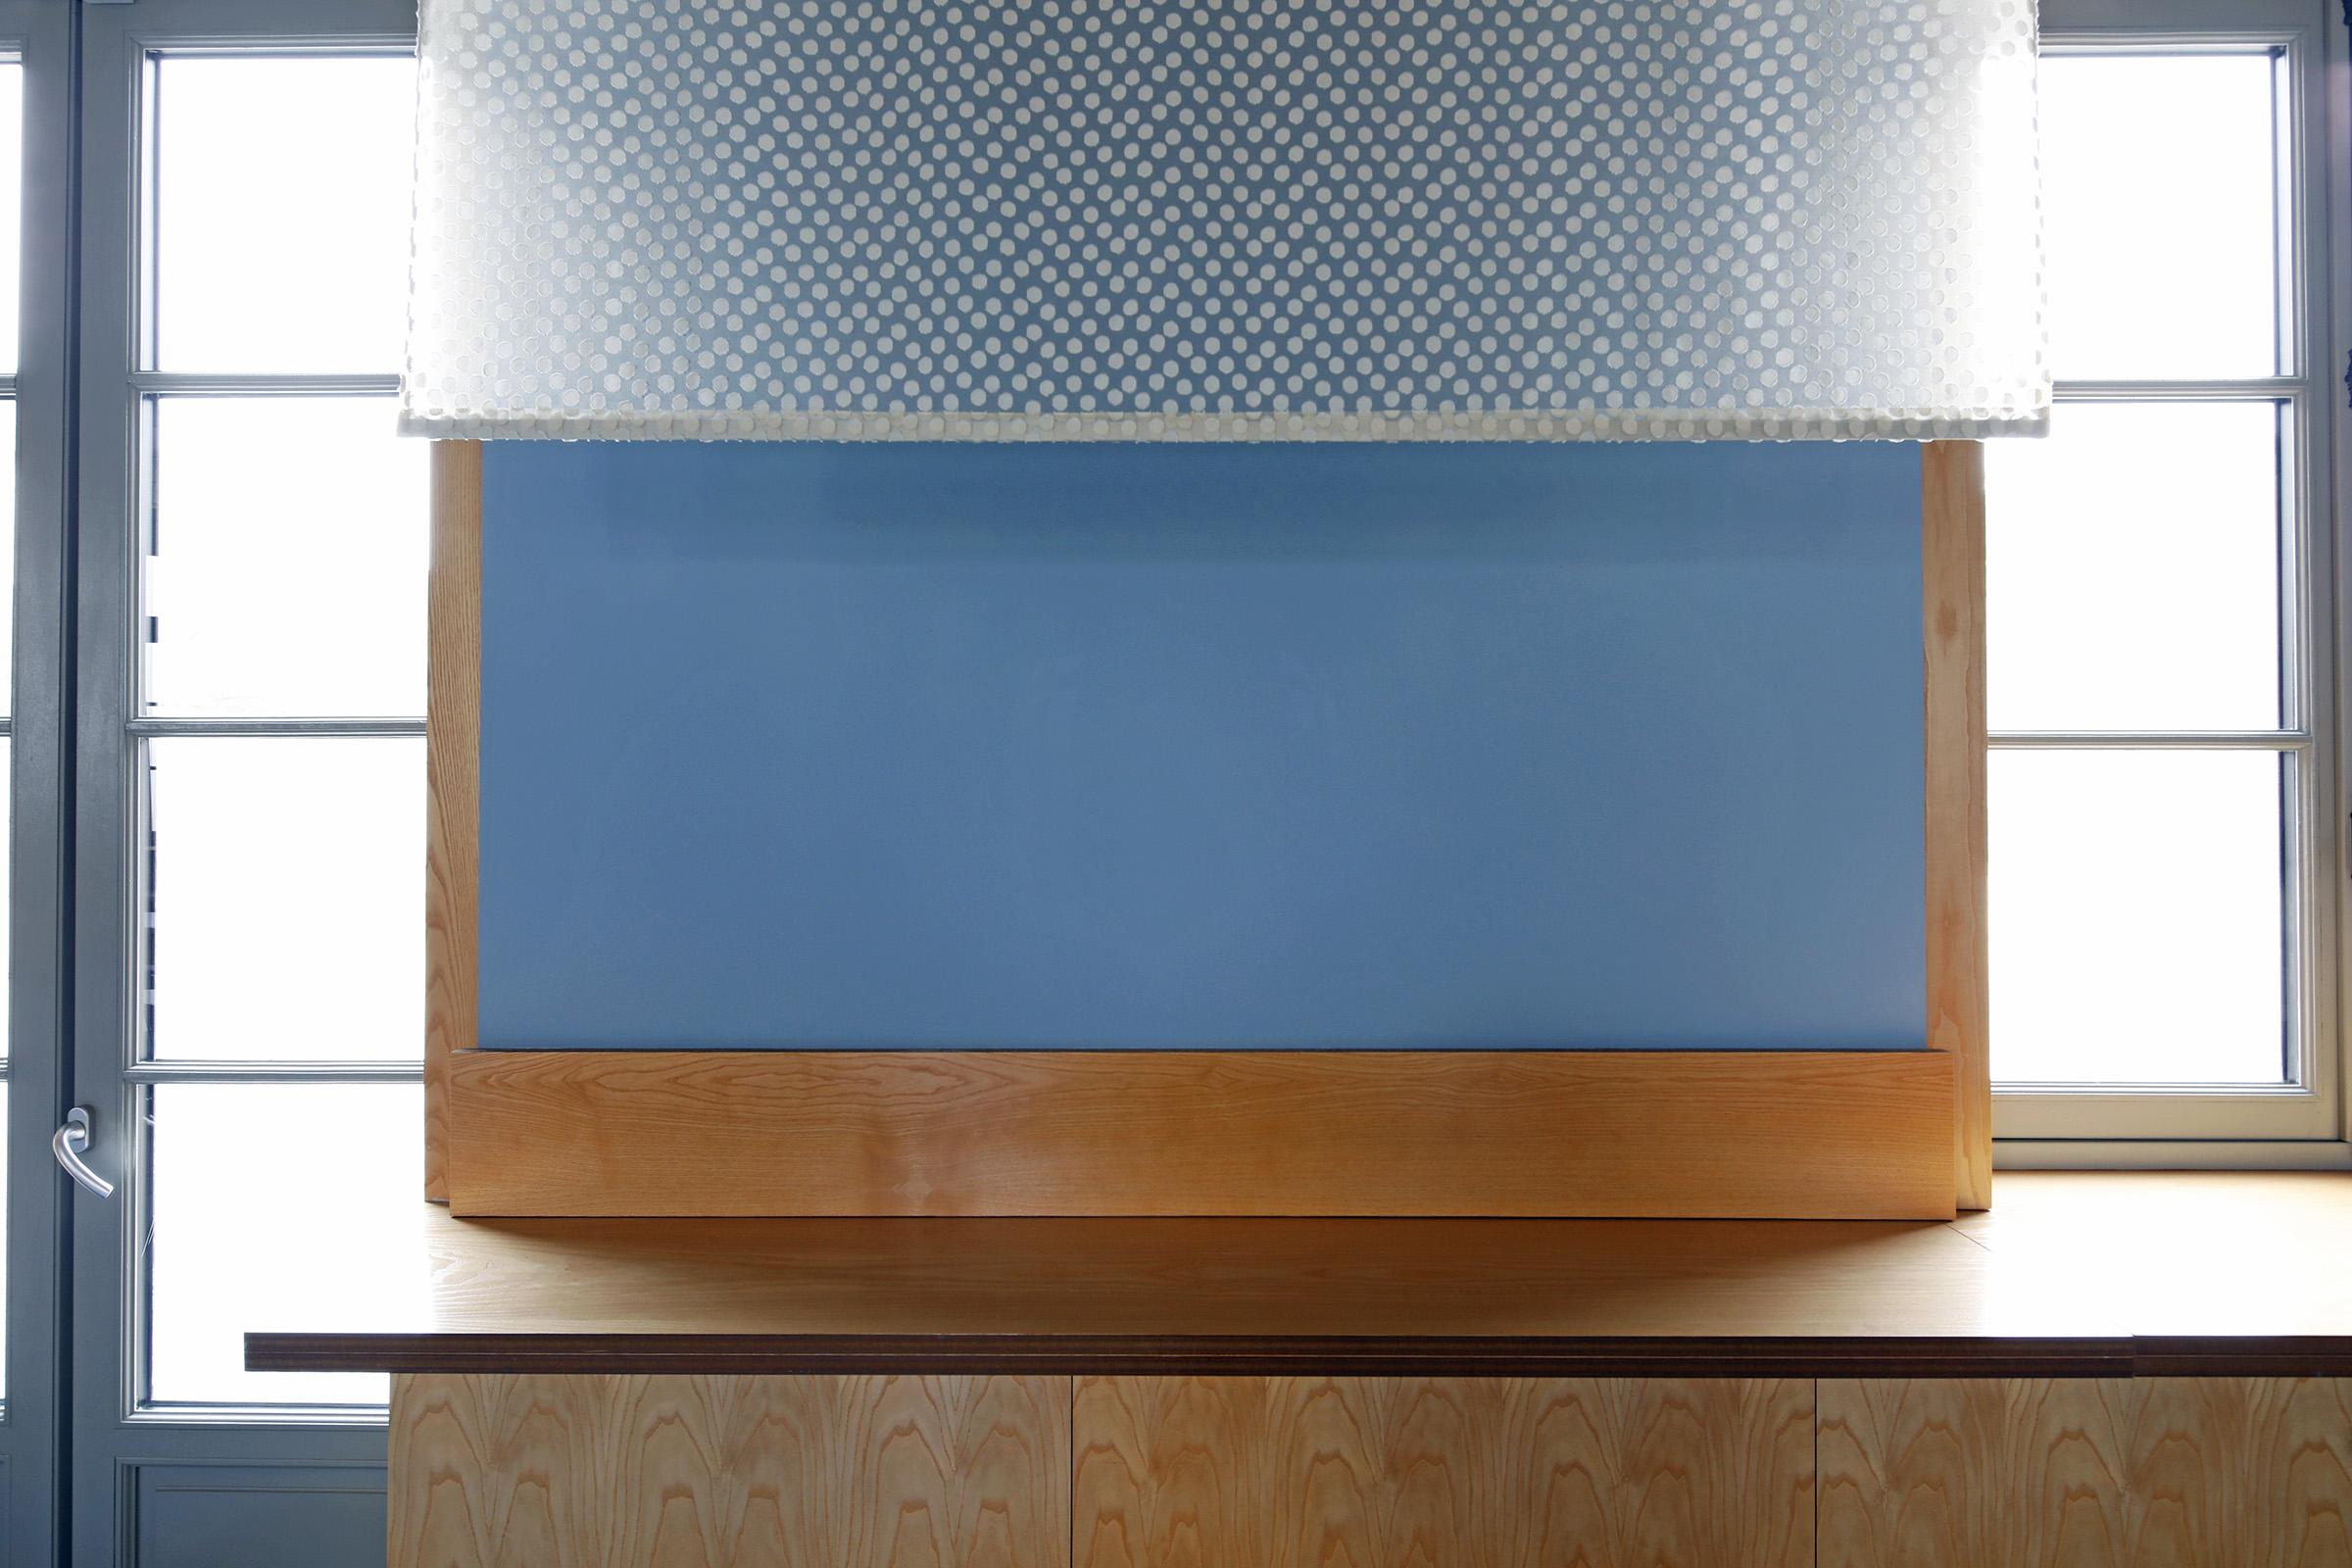 Amilly - La Maison Saint Loup - Interieur - Sylvain Dubuisson 023.jpg